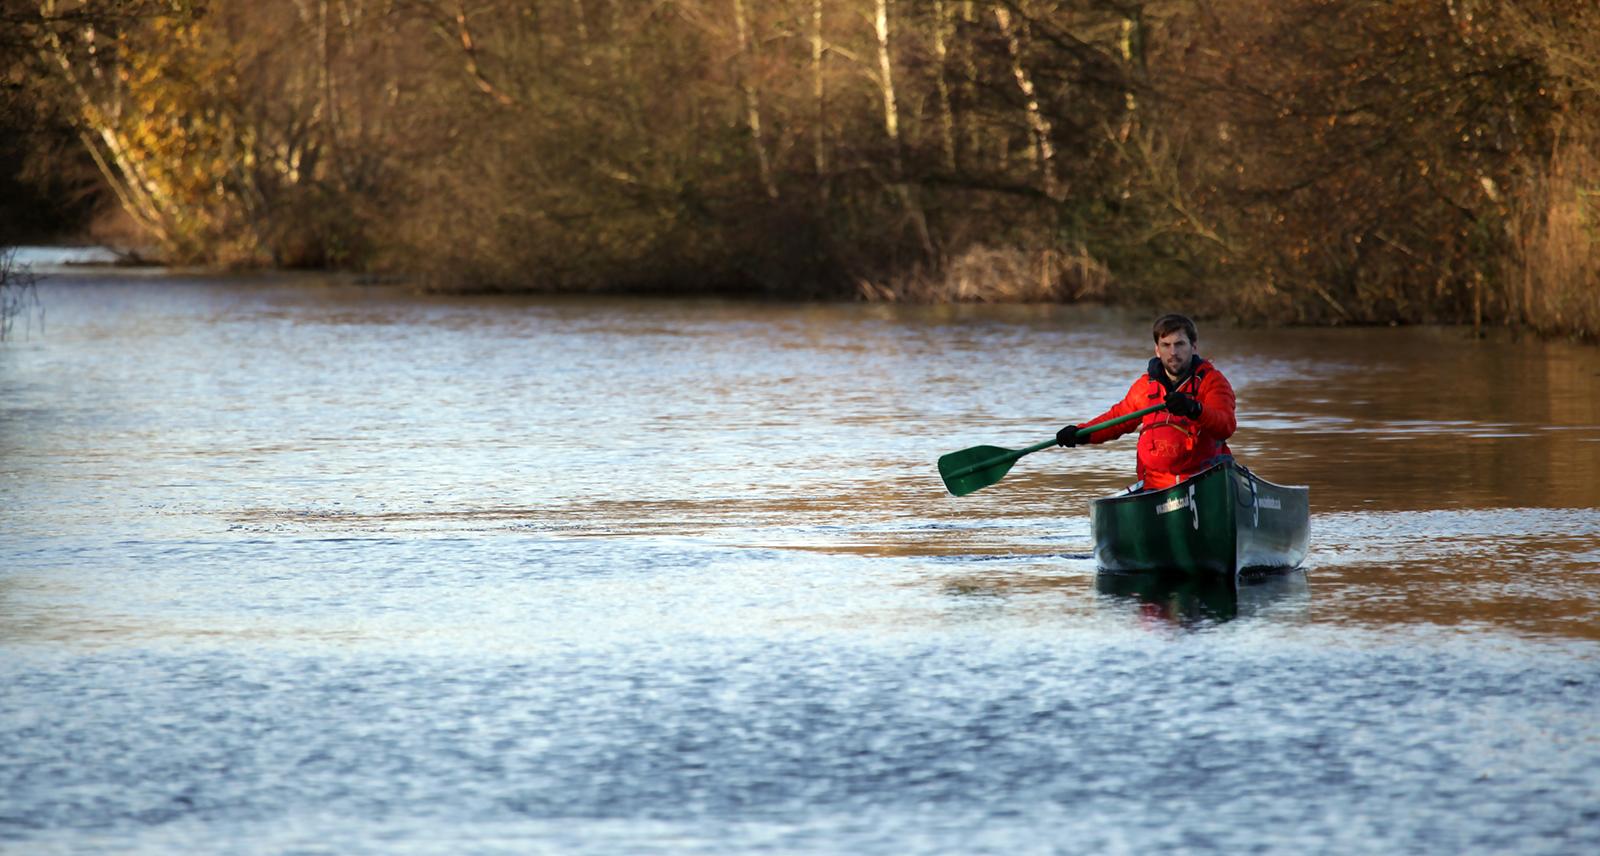 Great British MINI Adventure Day 1 - Canoeing in the Broads